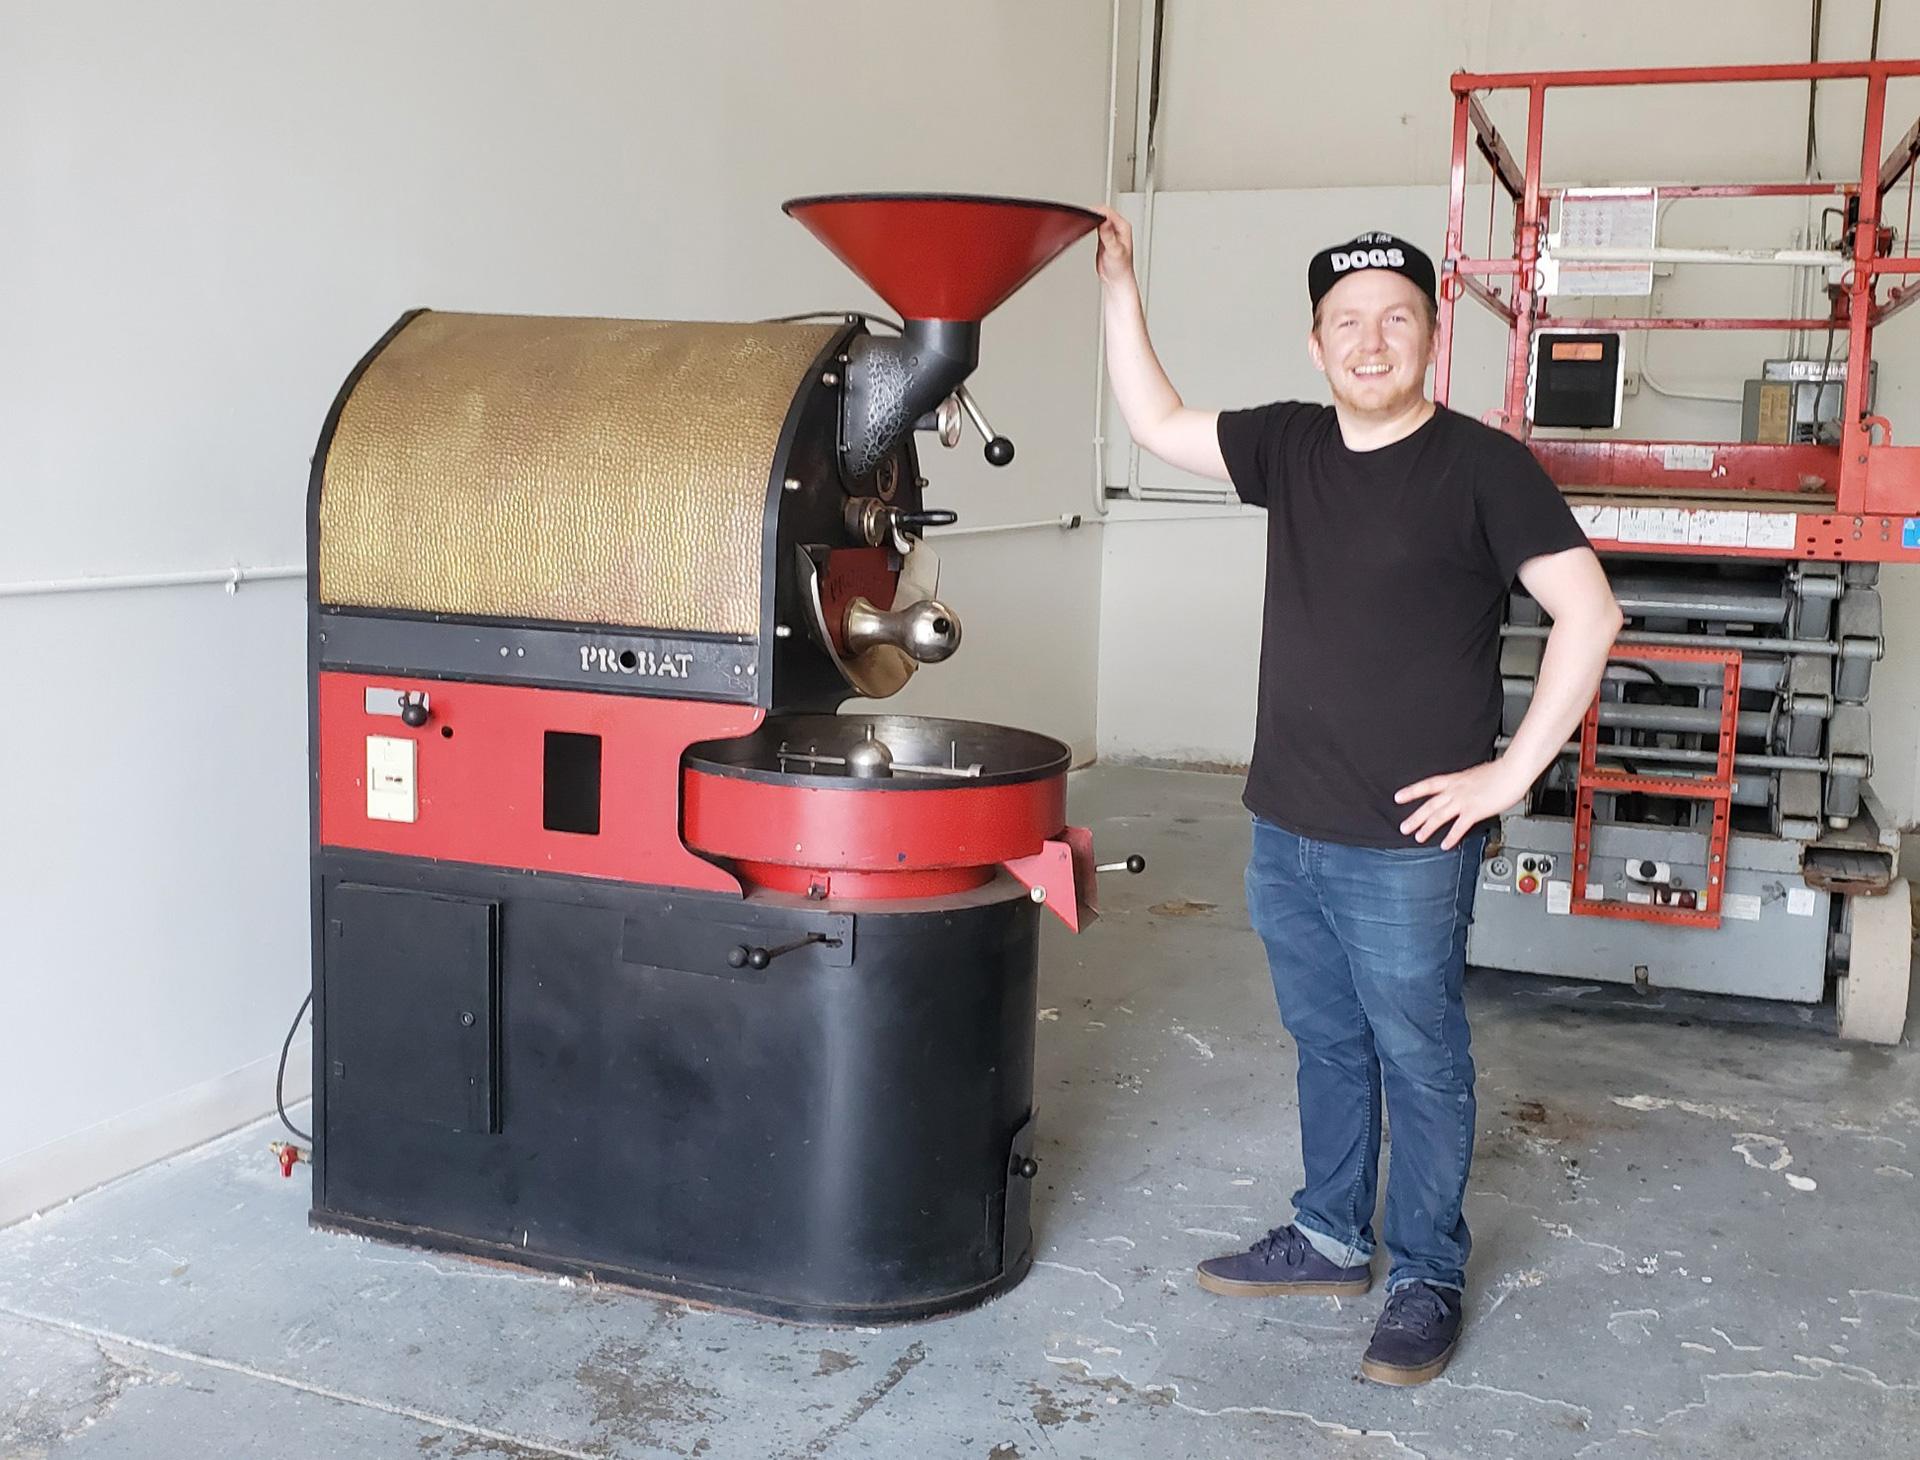 littlefoot coffee grandville michigan